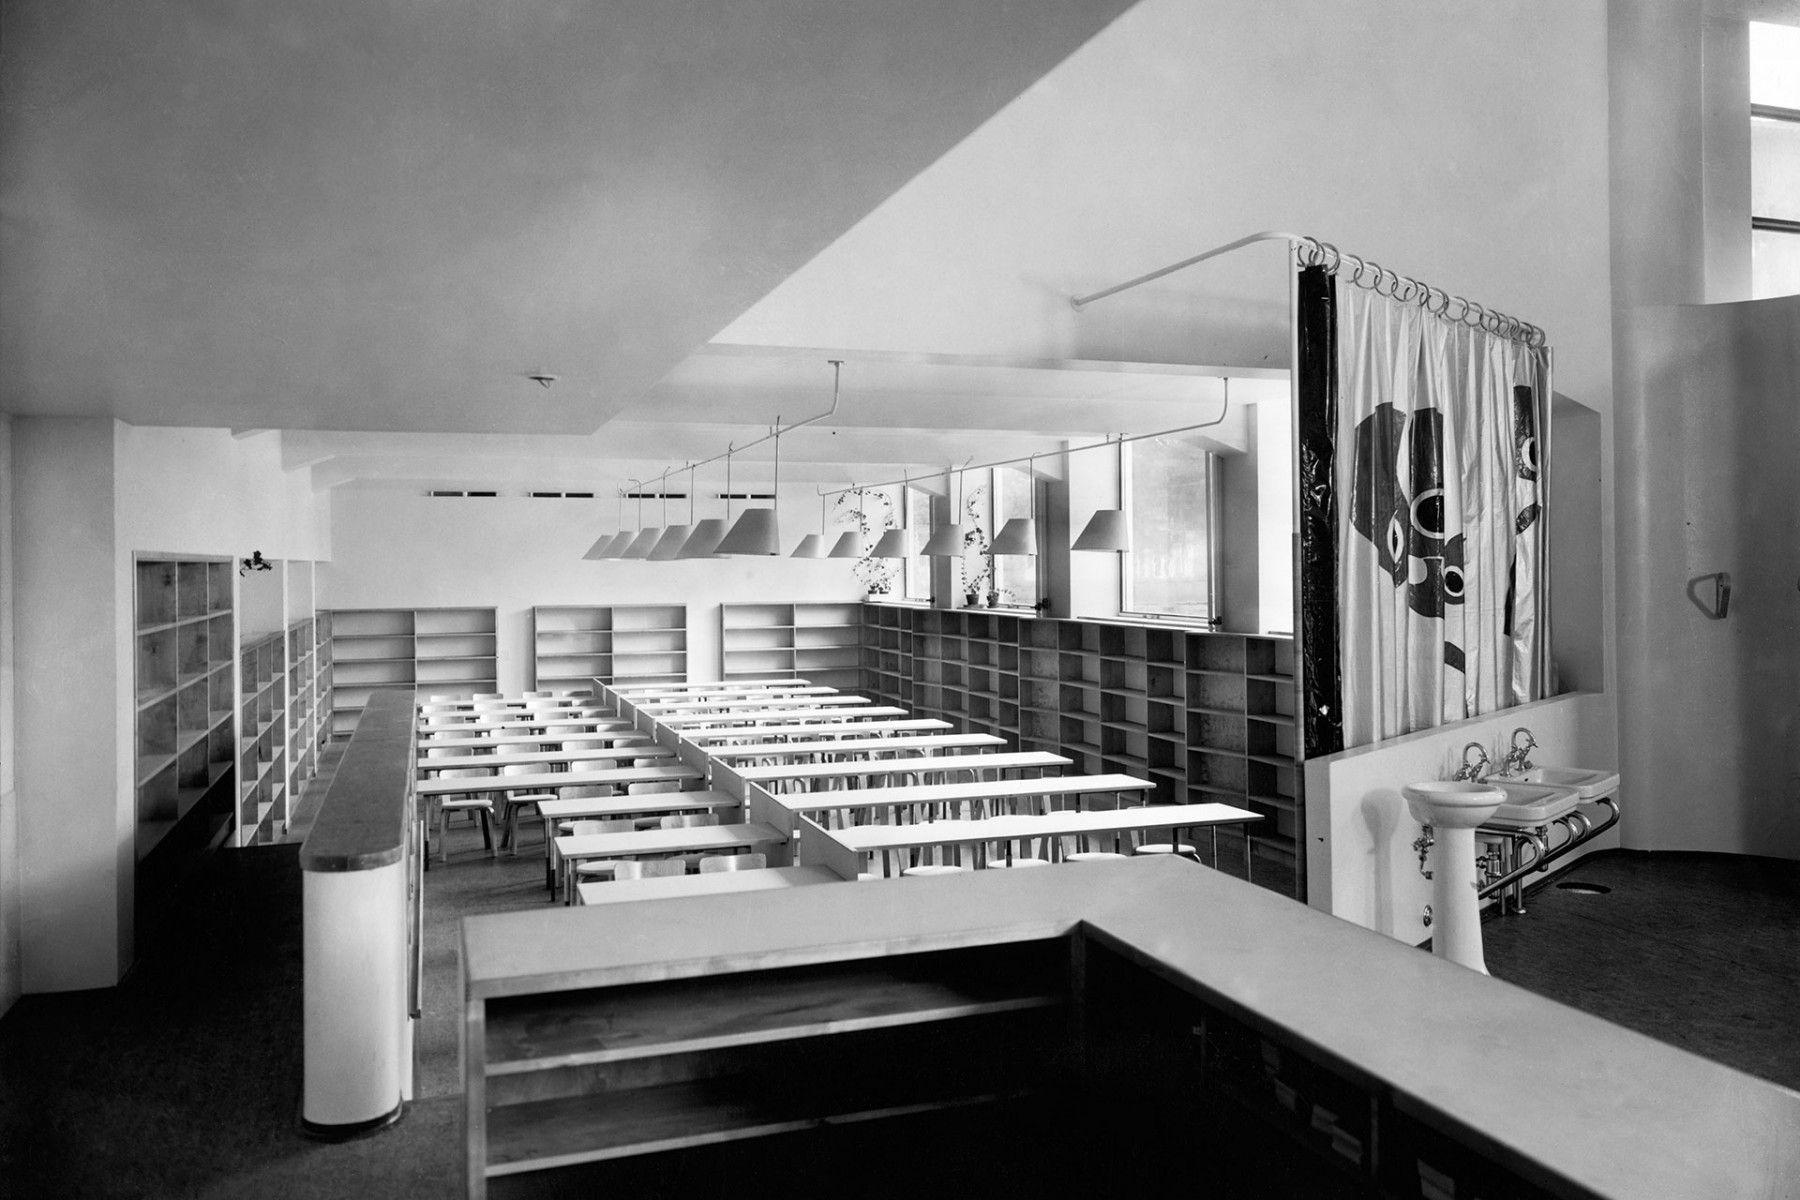 Alvar aalto house interior aino marsioaalto u alvar aaltous viipuri library interior of the